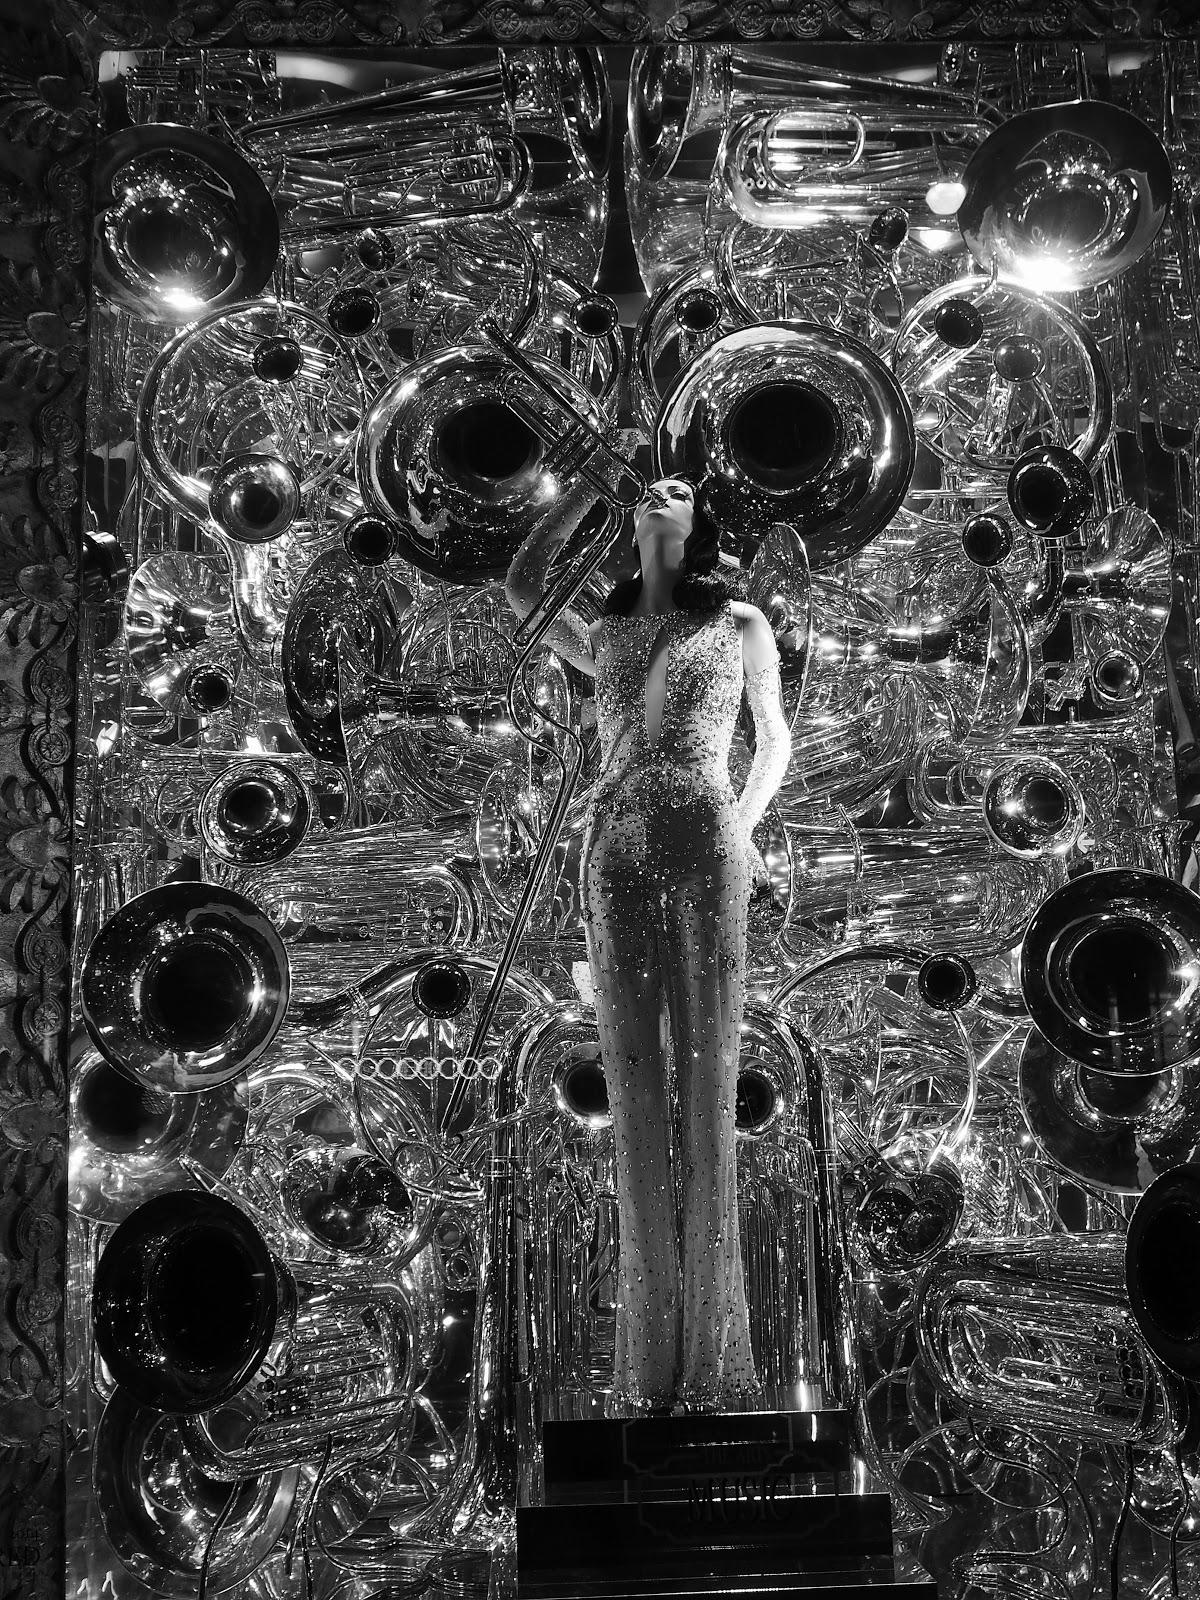 Inspired by Music (Night) #inspiredbymusic(night) #bgwindows #windowwatchers #holidaywindows #5thavenuewindows #NYC  #holidays #besttimeoftheyear #nyc ©2014 Nancy Lundebjerg